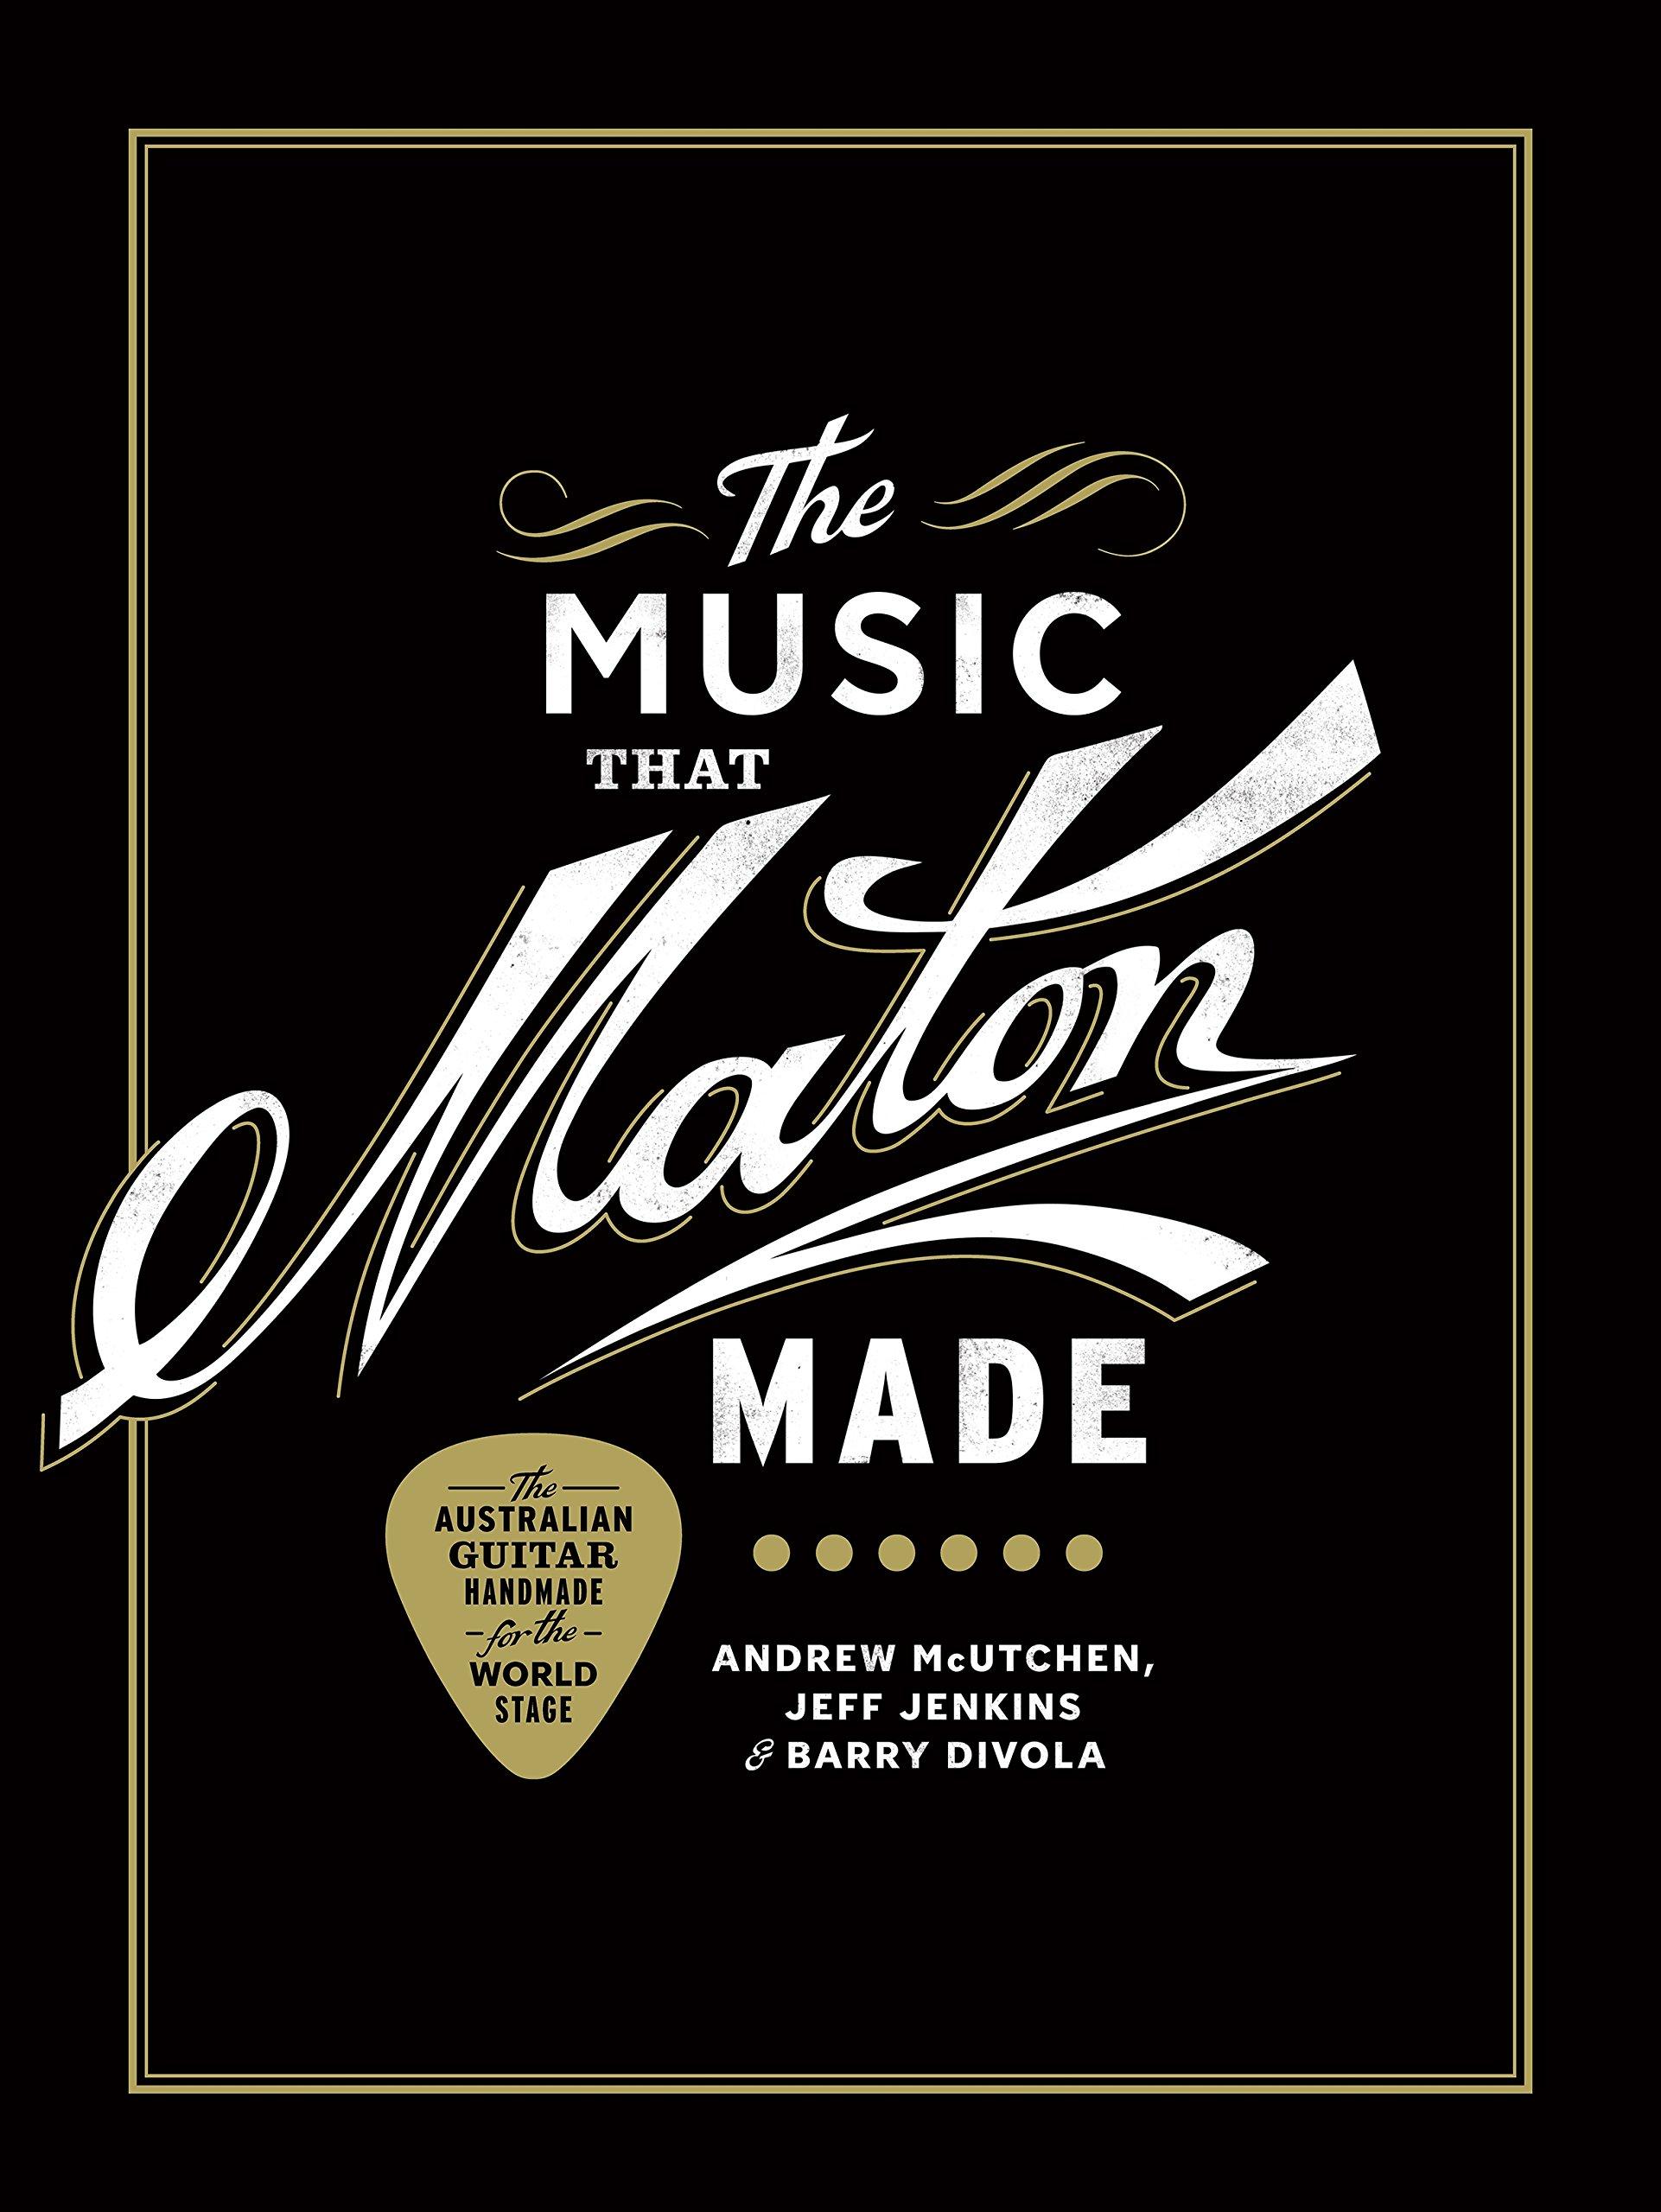 The Music That Maton Made